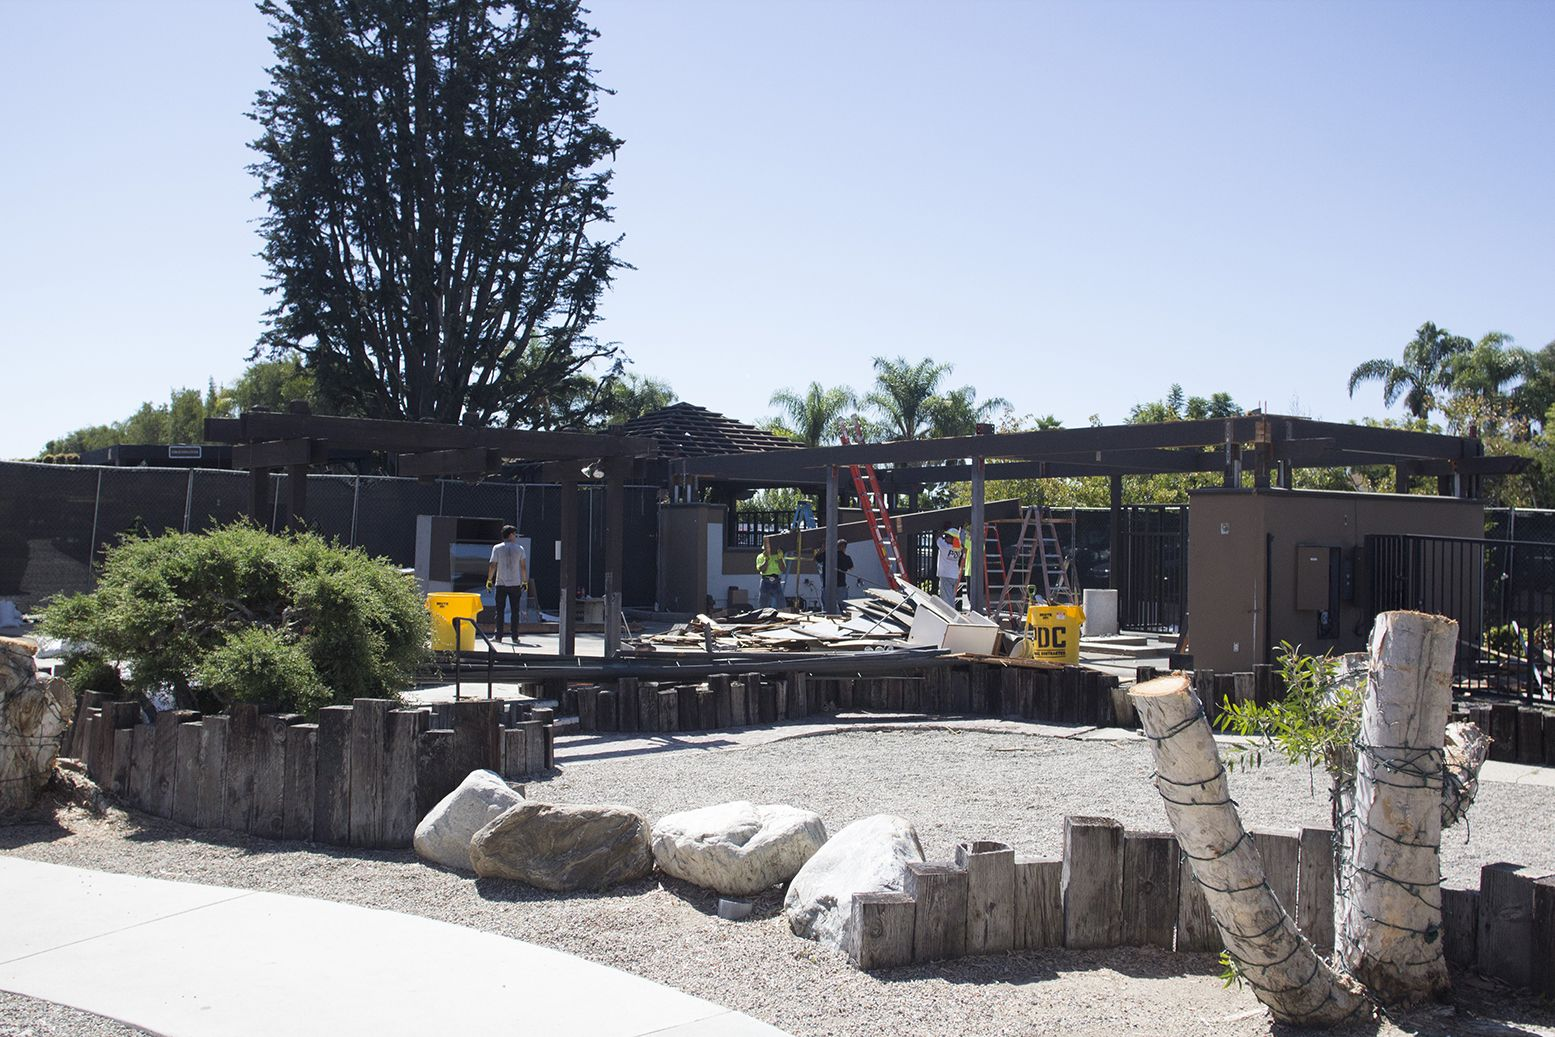 September 26, 2015 Trees are gone; tear down begins http